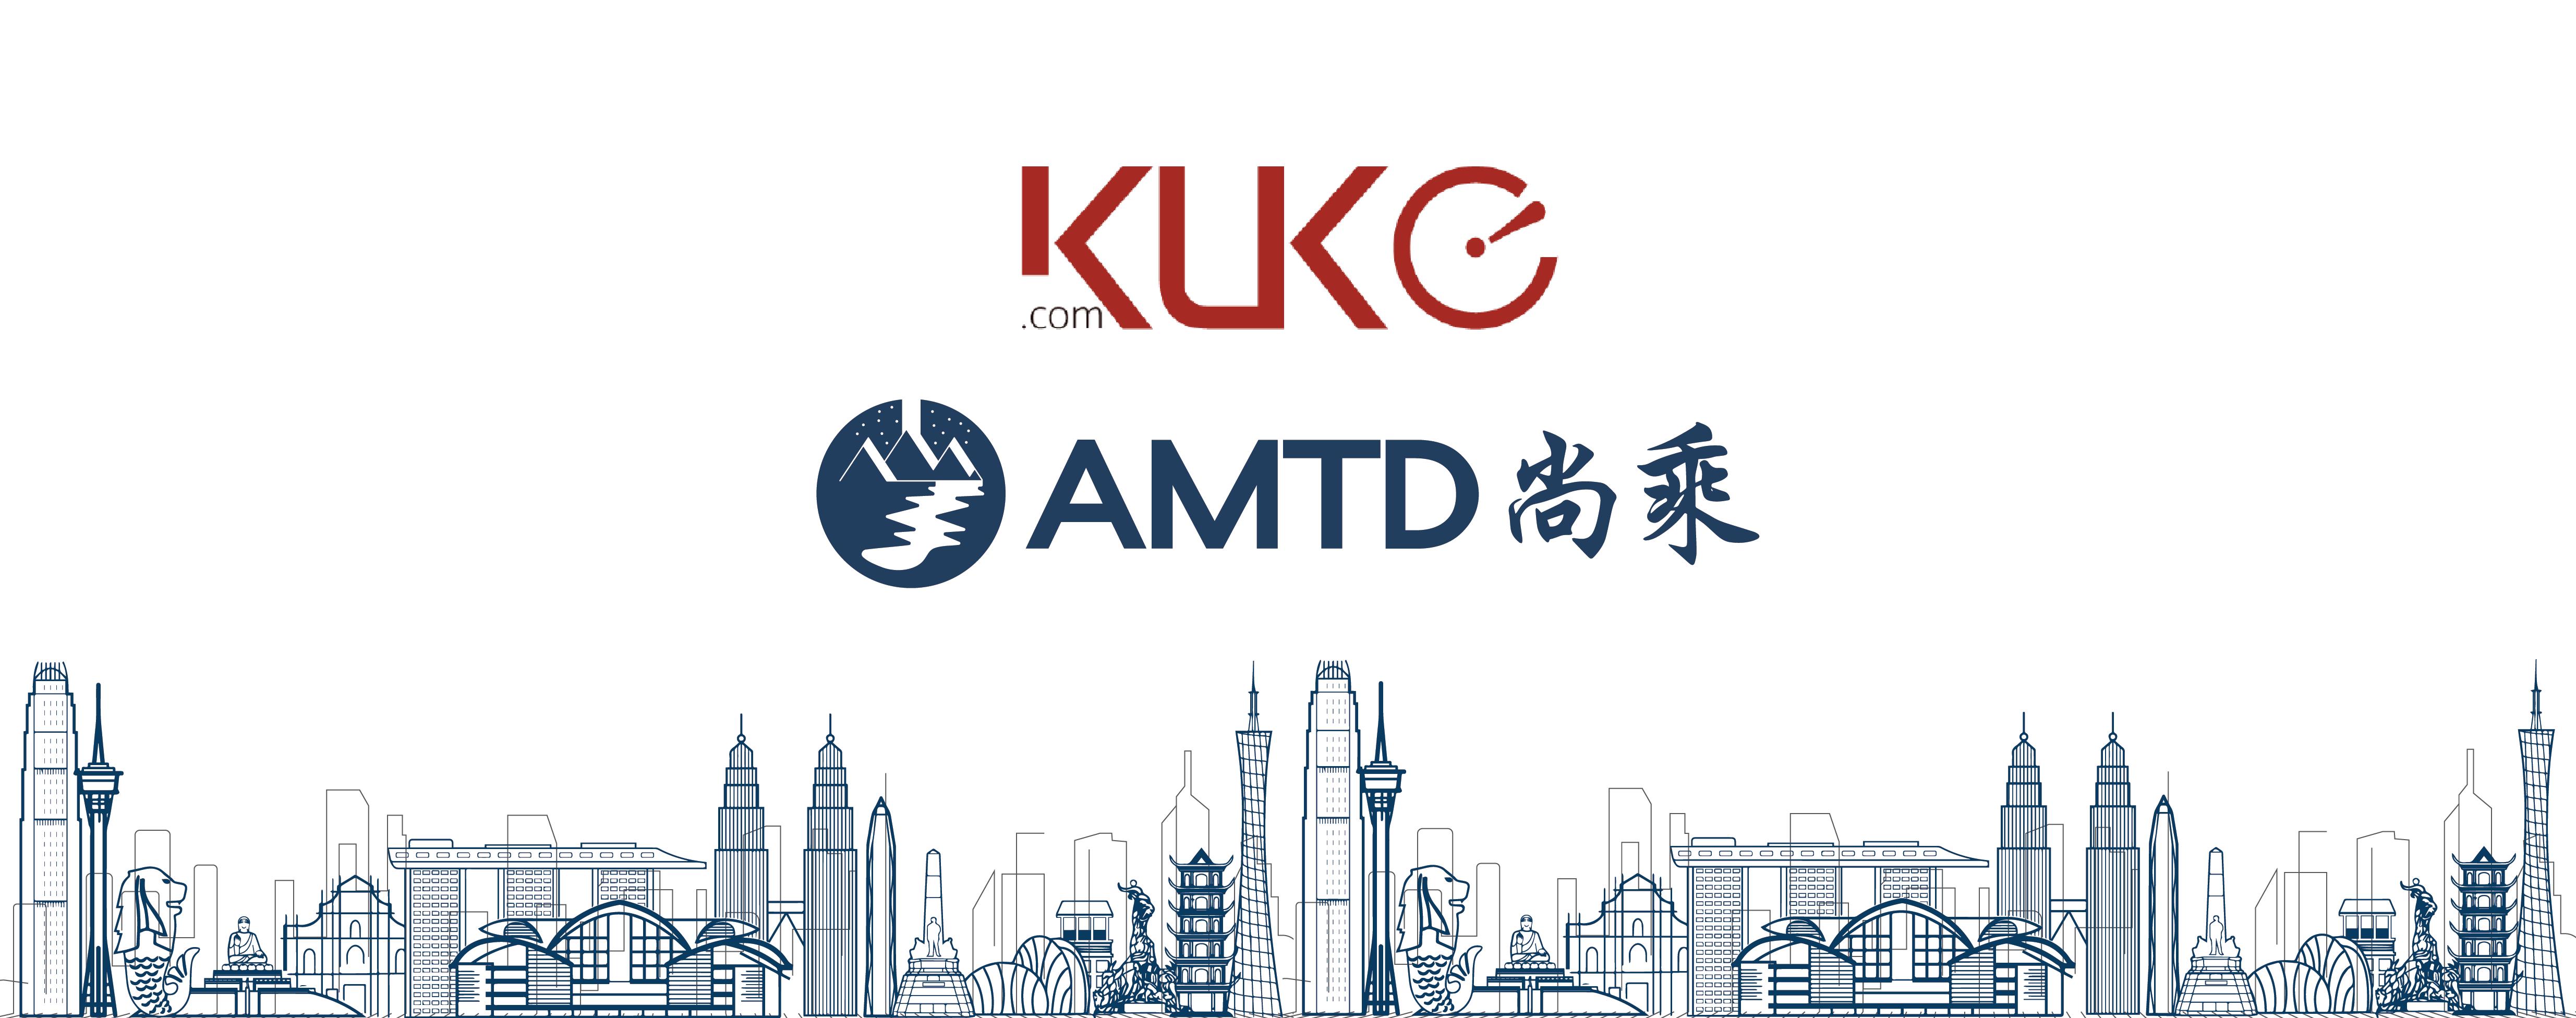 AMTD Deals | AMTD Leads the US IPO of Kuke Music on NYSE